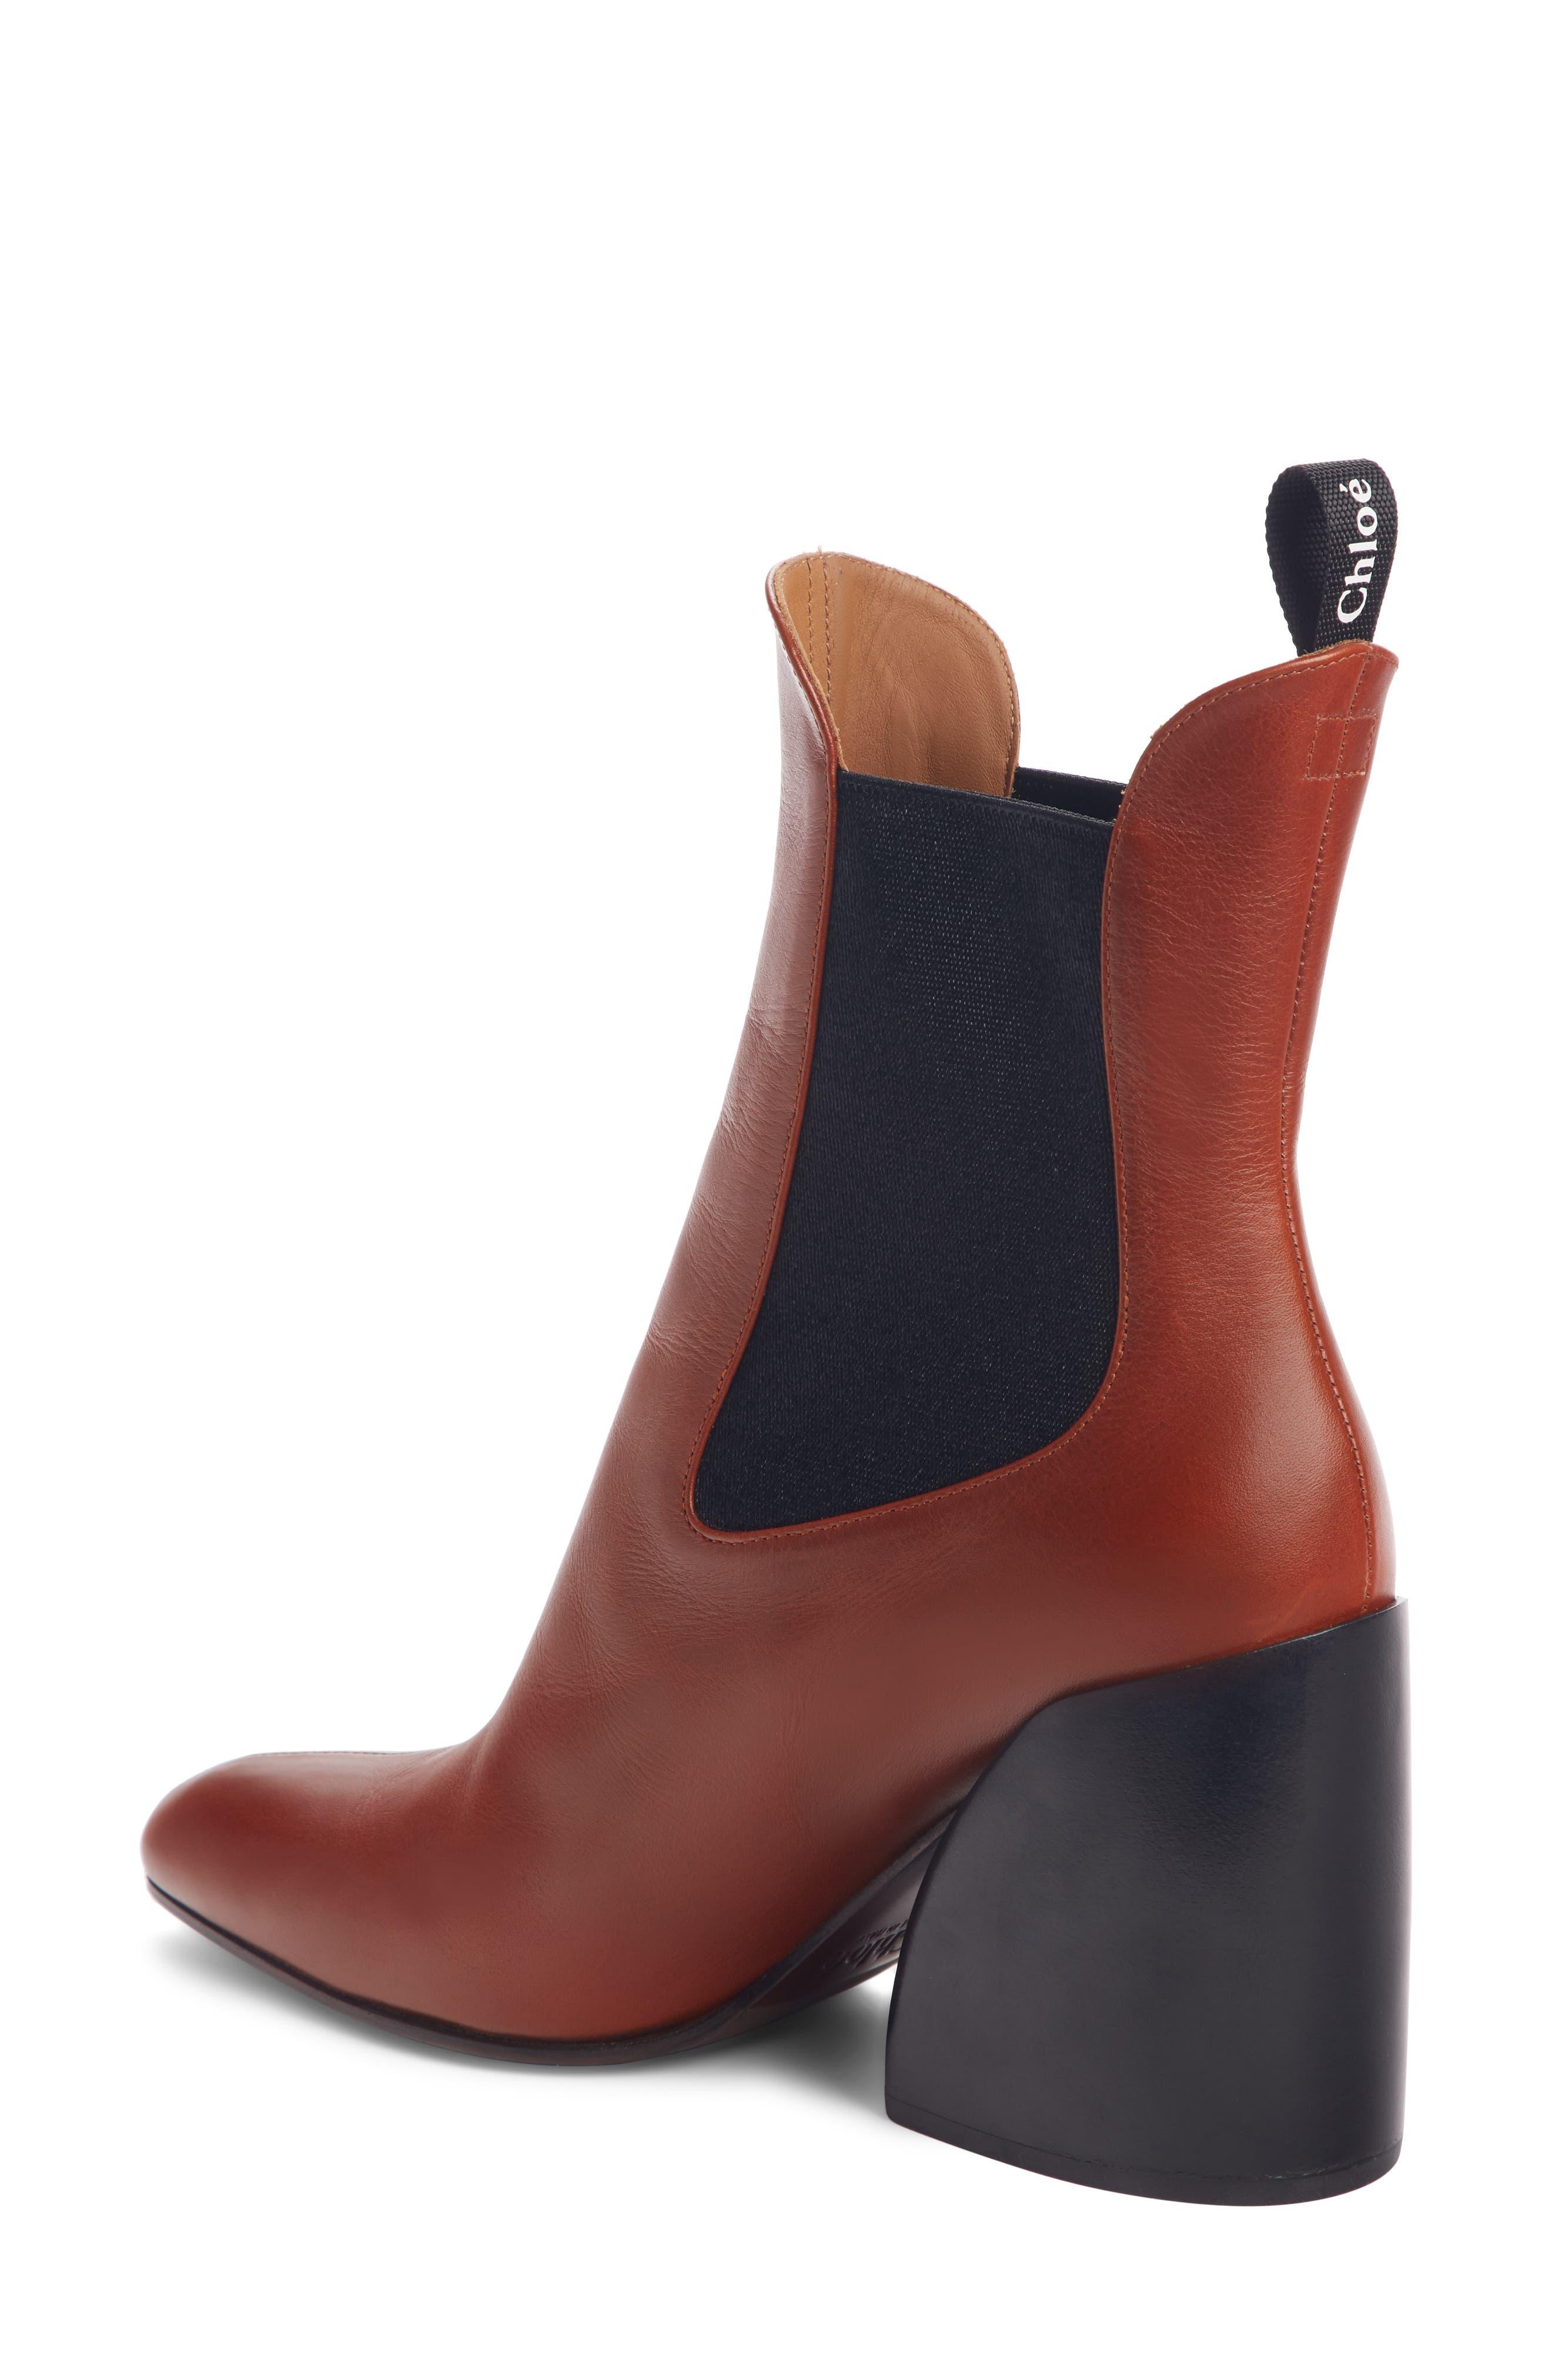 817ae8c73e1f Chloé Women s Boots Shoes